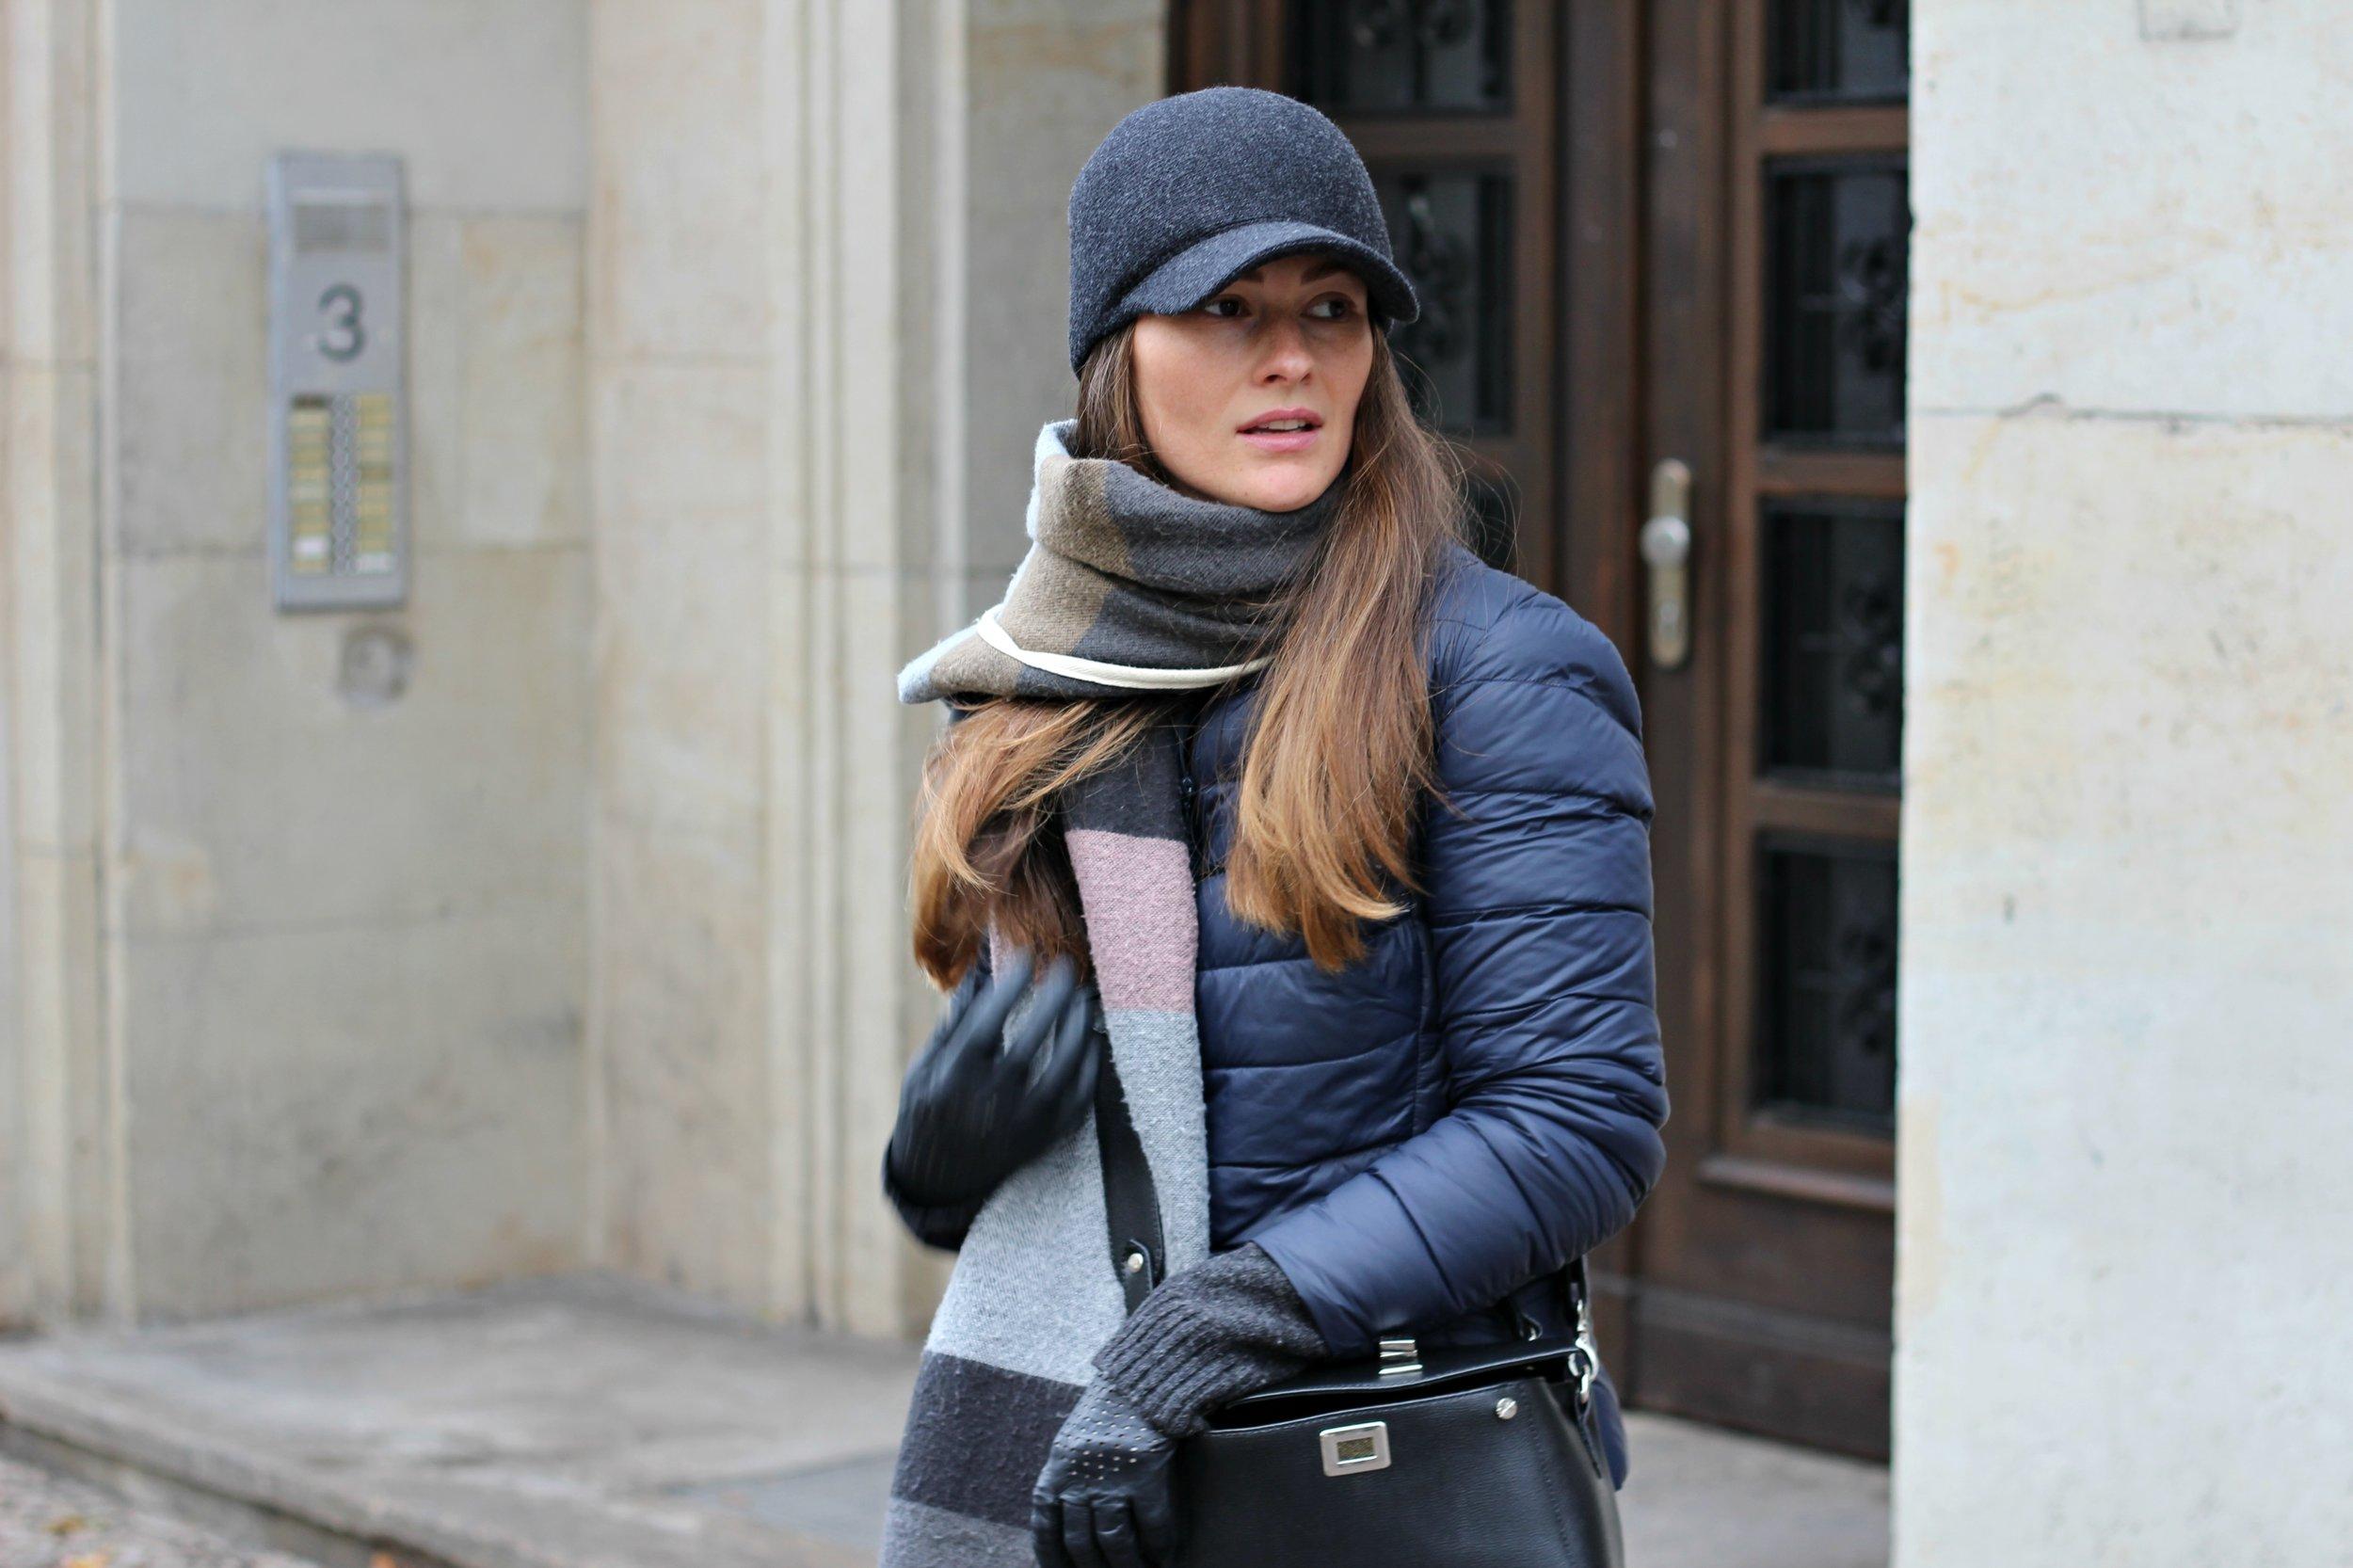 annaporter-benneton-black-cap-casual-outwear-2